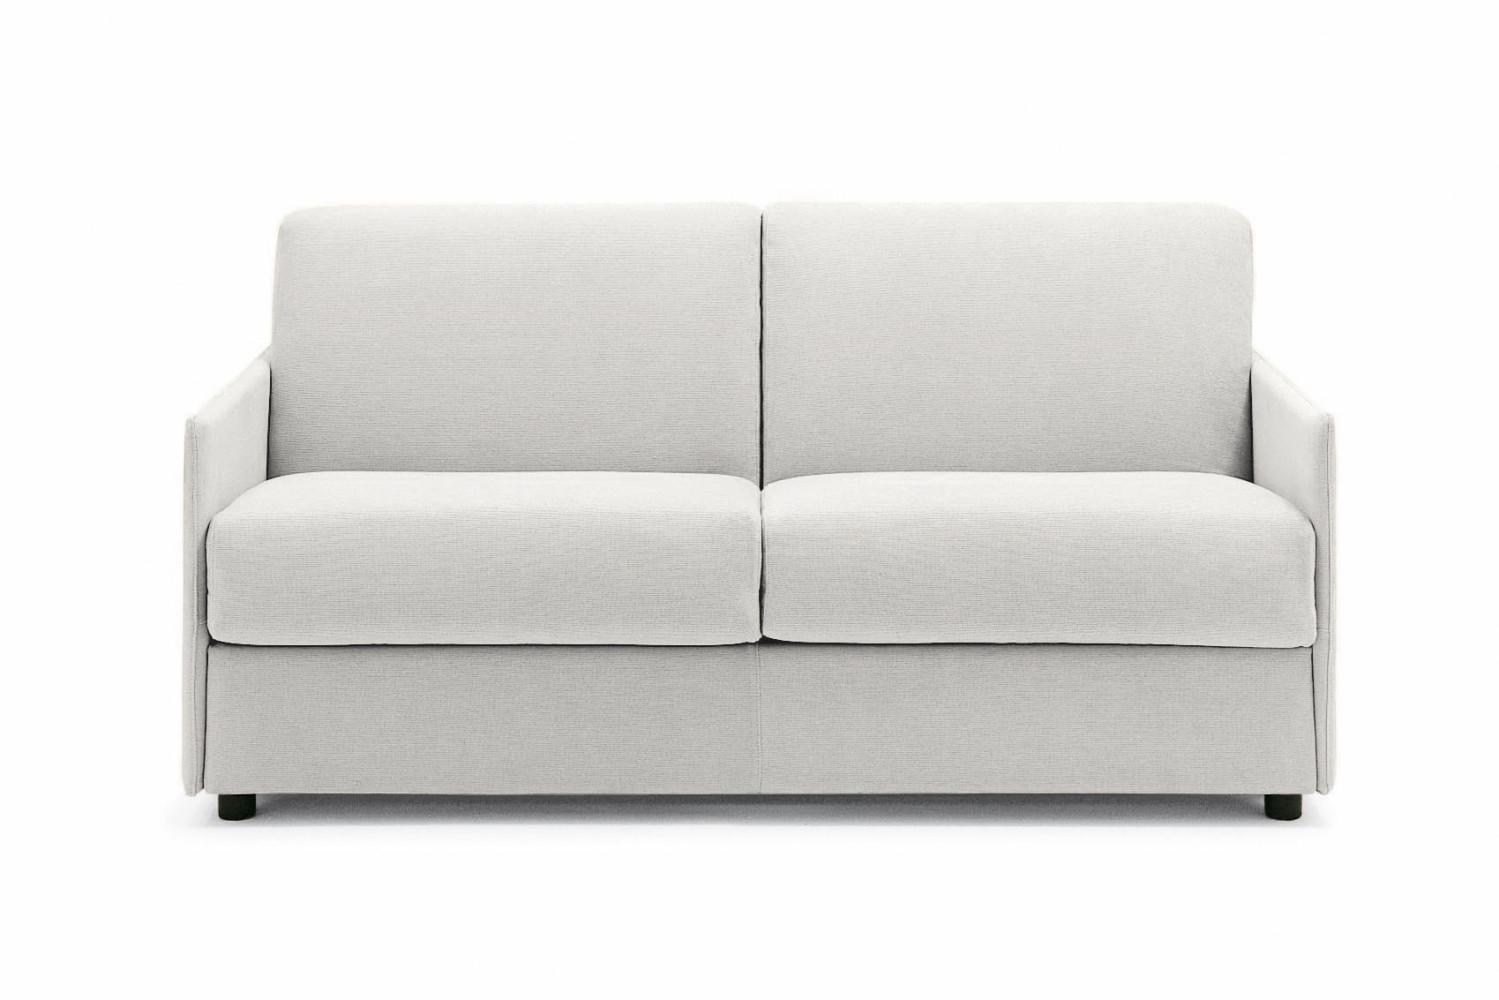 canap en cuir italien haut de gamme lampo. Black Bedroom Furniture Sets. Home Design Ideas